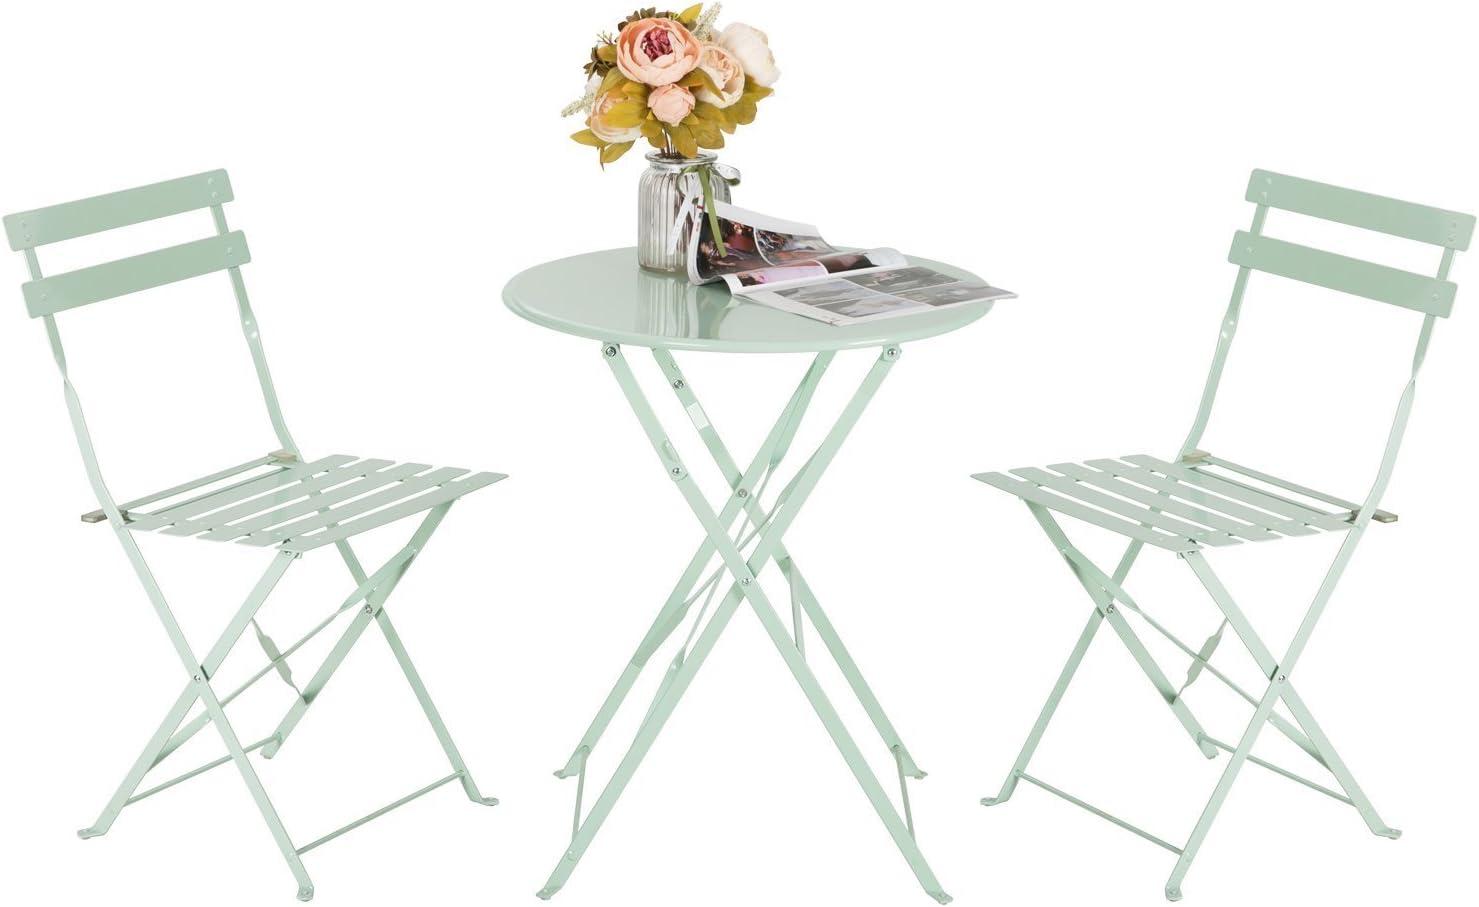 HollyHOME - Juego de Muebles de balcón Plegables de Acero para ...